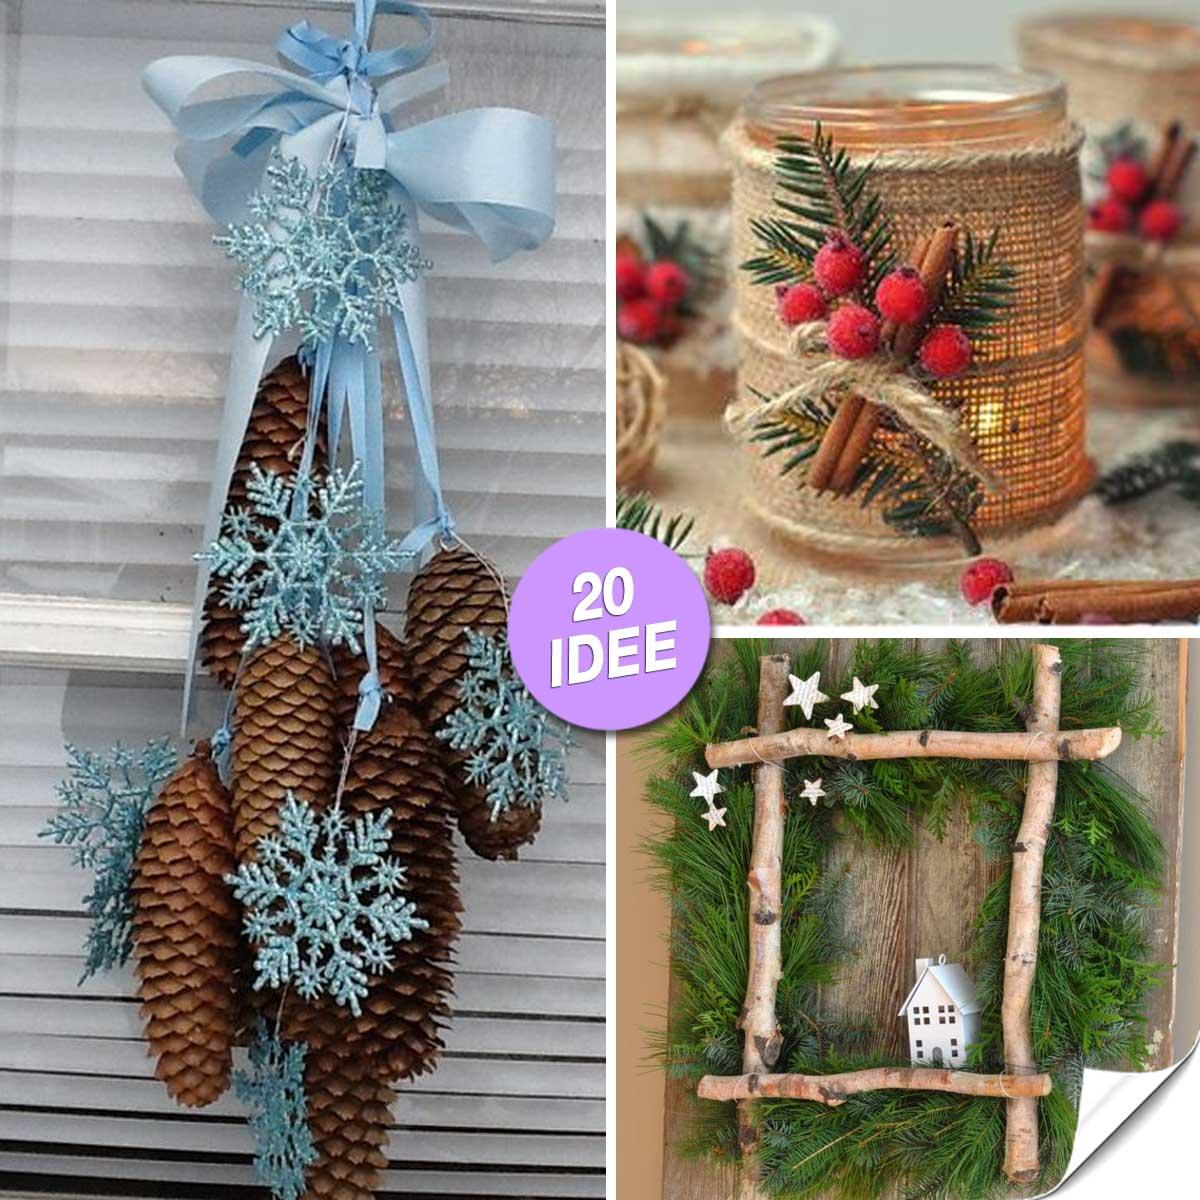 Decorazioni Natalizie Giardino Fai Da Te.Idee Addobbi Natale Giardino